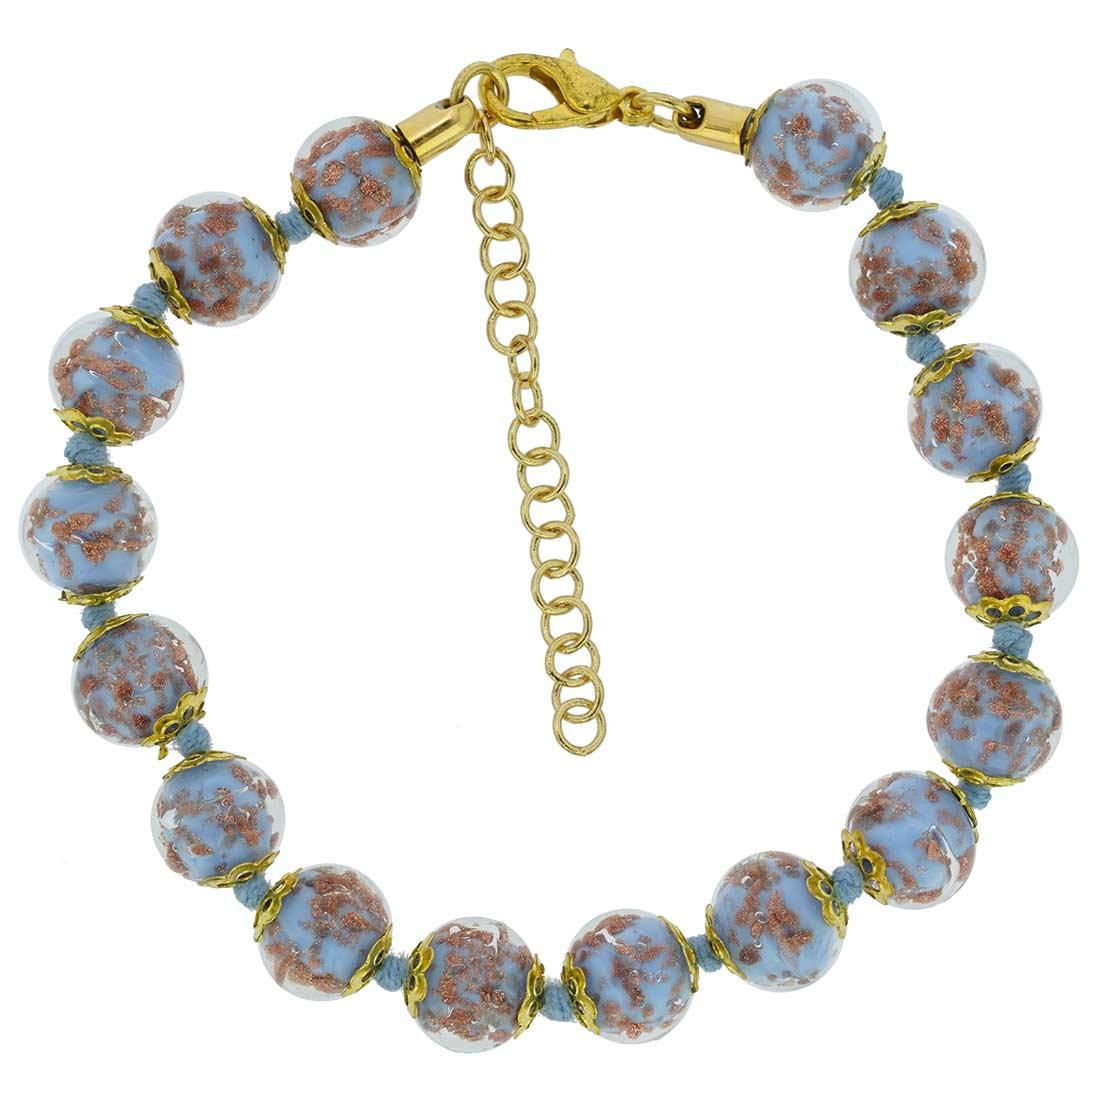 Sommerso Bracelet - Periwinkle